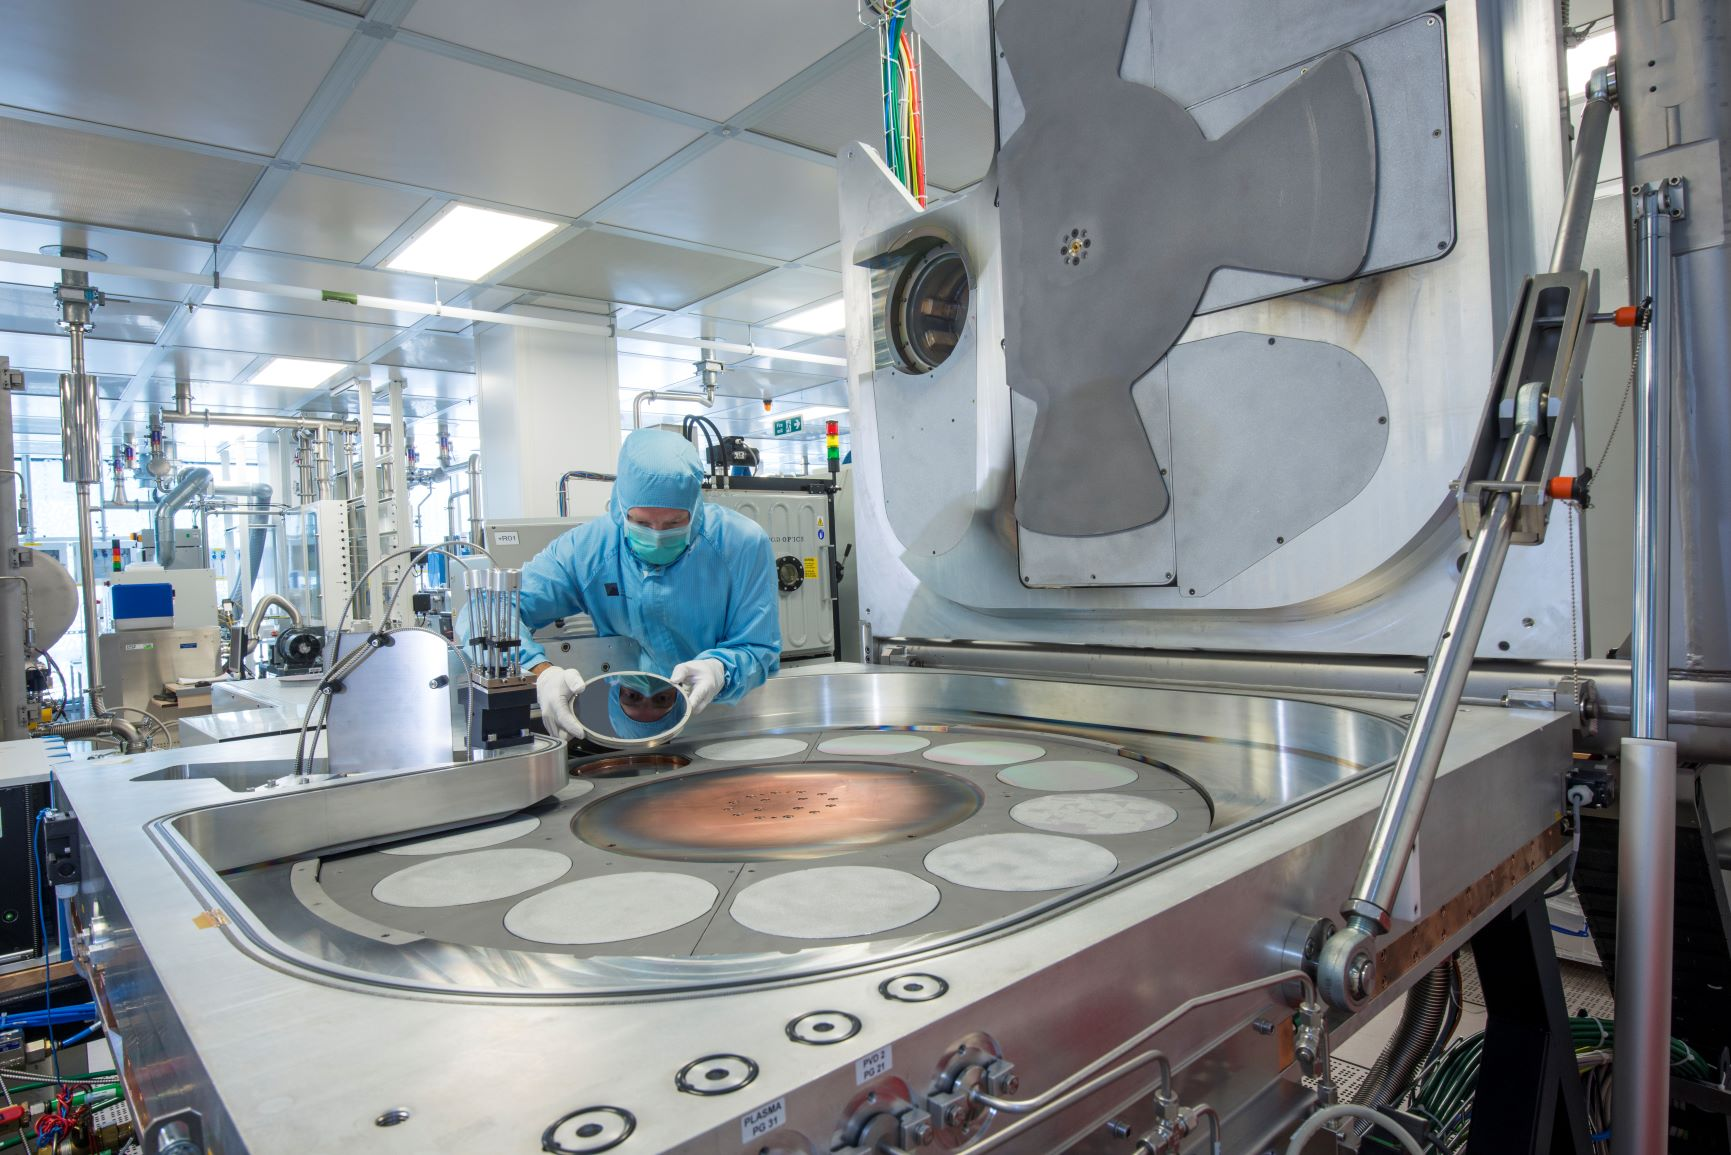 Buhler Leybold Optics Helios Sputtering Tool